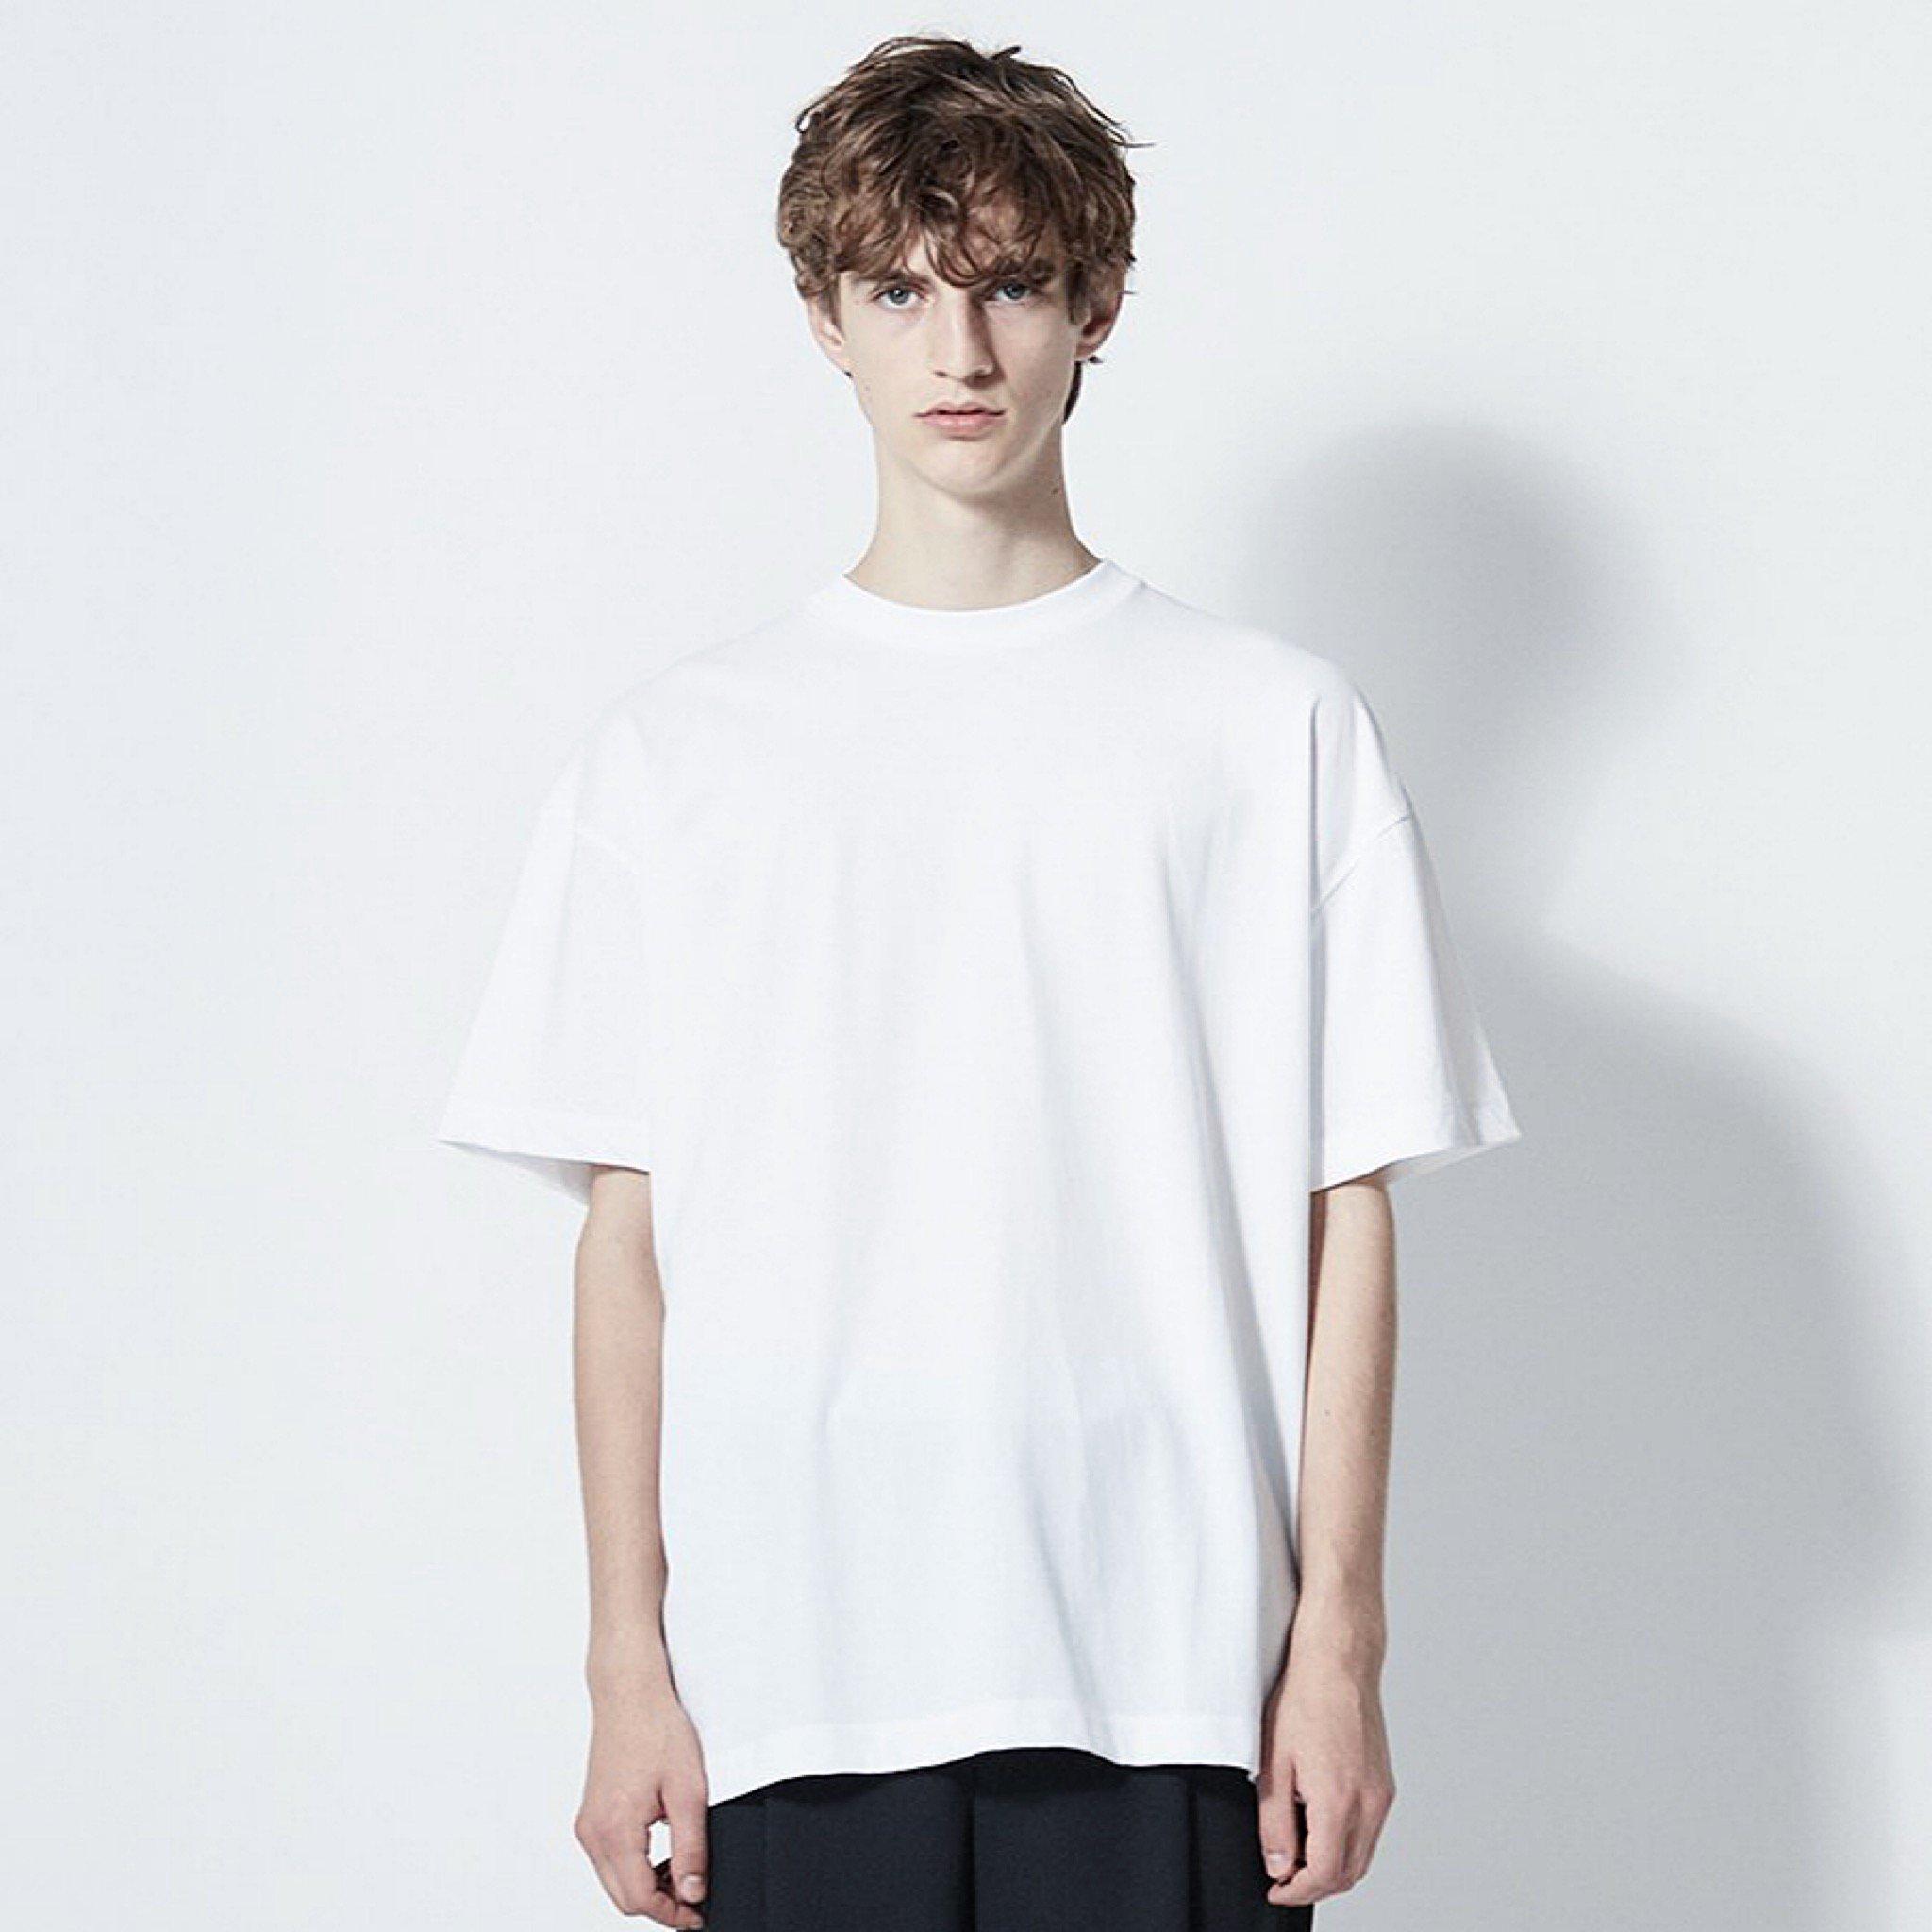 【ATON】<br> フレスカ プレート オーバーサイズ <br>Tシャツ